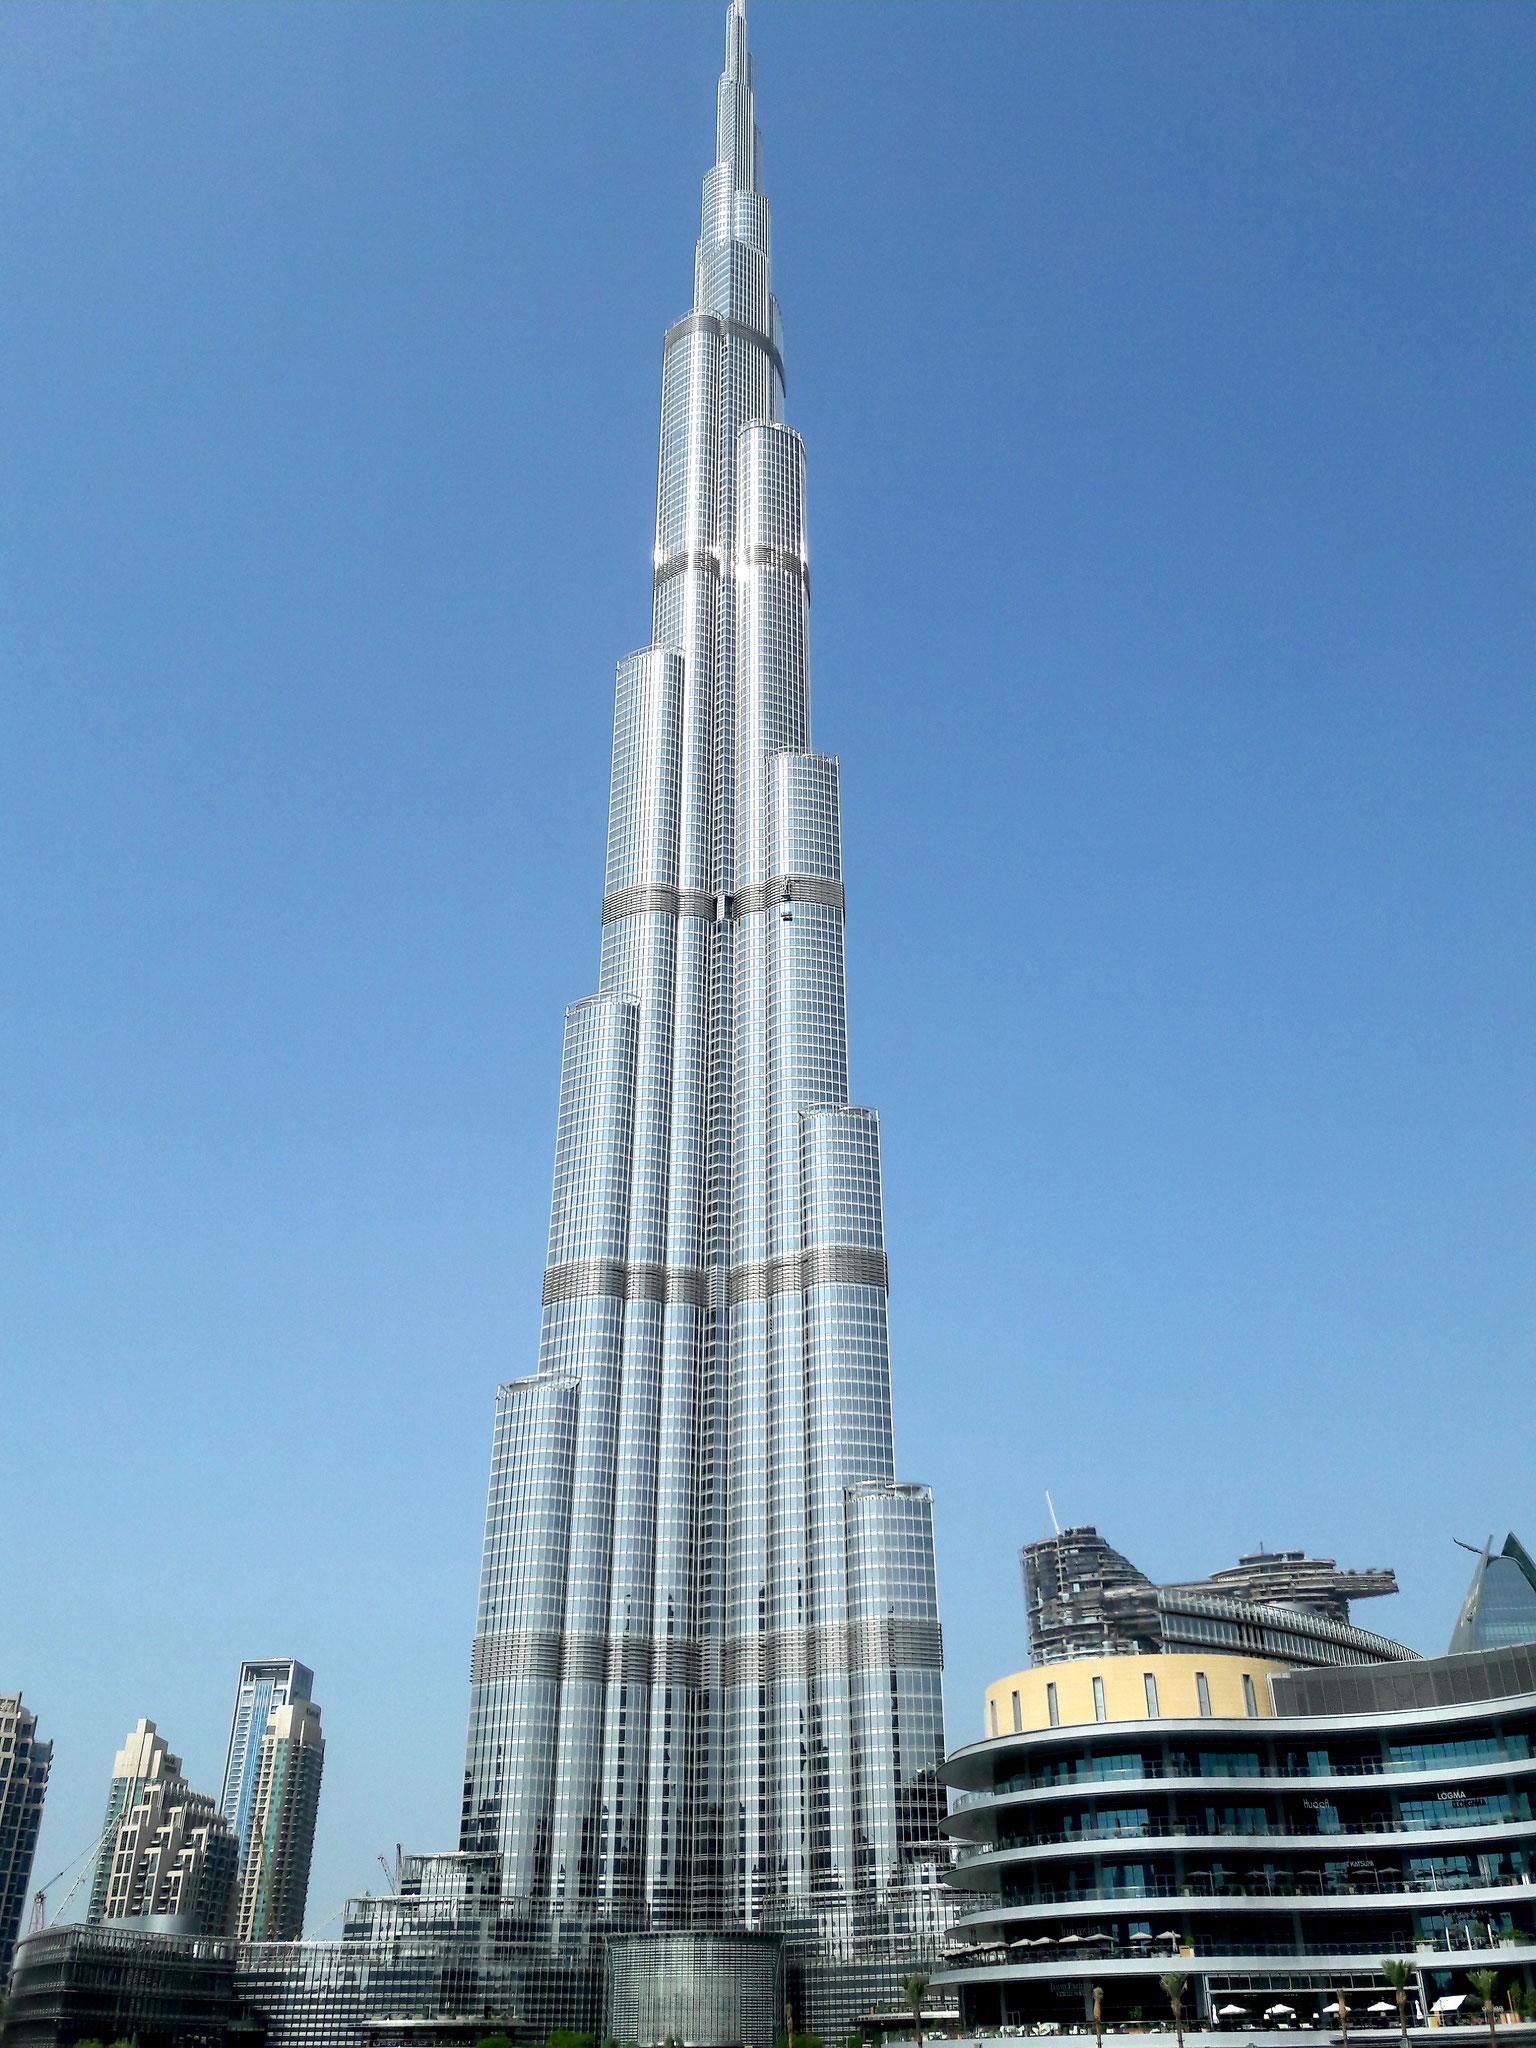 Der Burj Khalifa wurde im Januar 2010 eröffnet